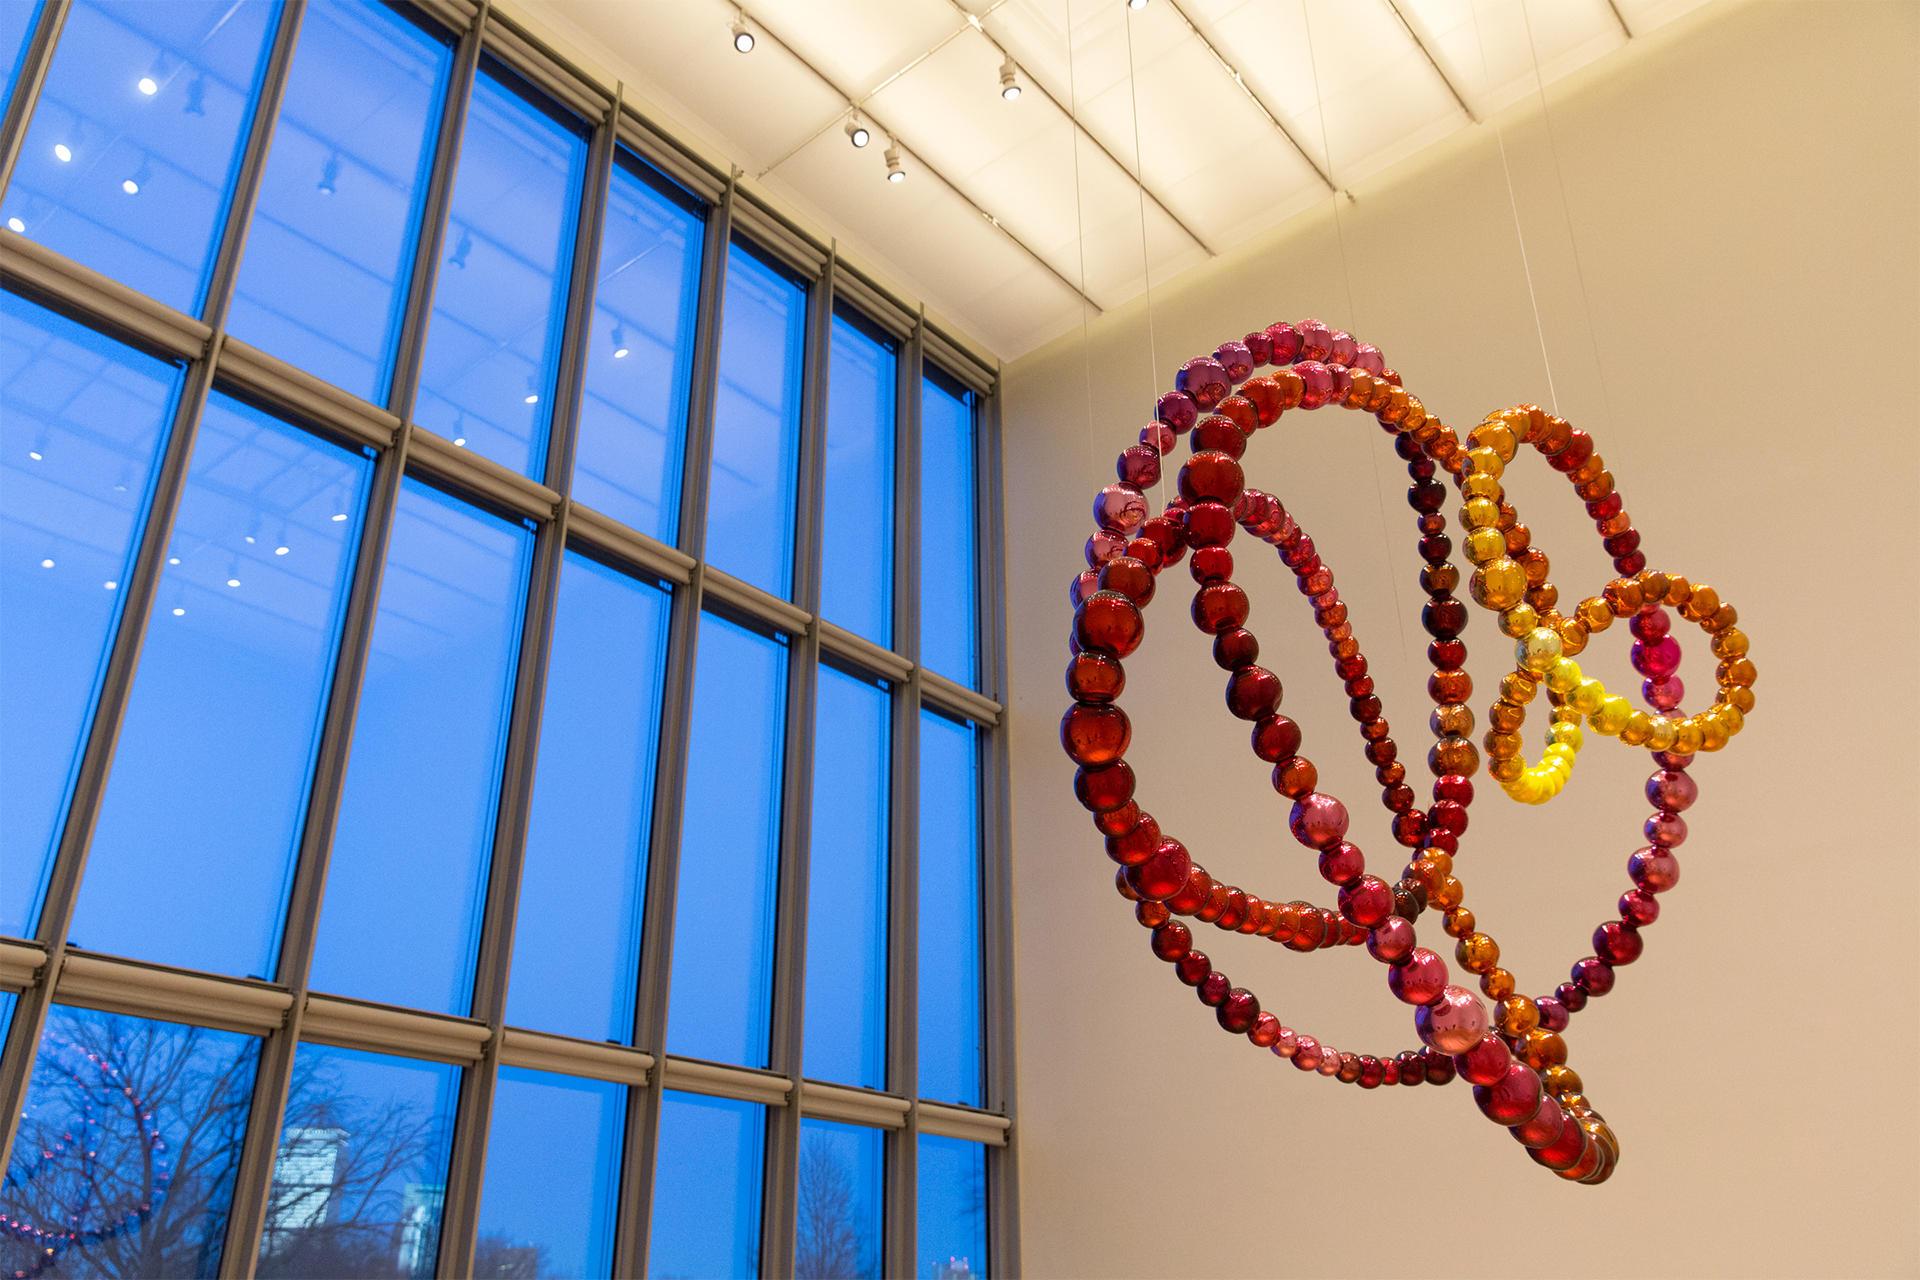 Jean-Michel Othoniel, Secret Flower Sculptures, Hostetter Gallery, 2015.